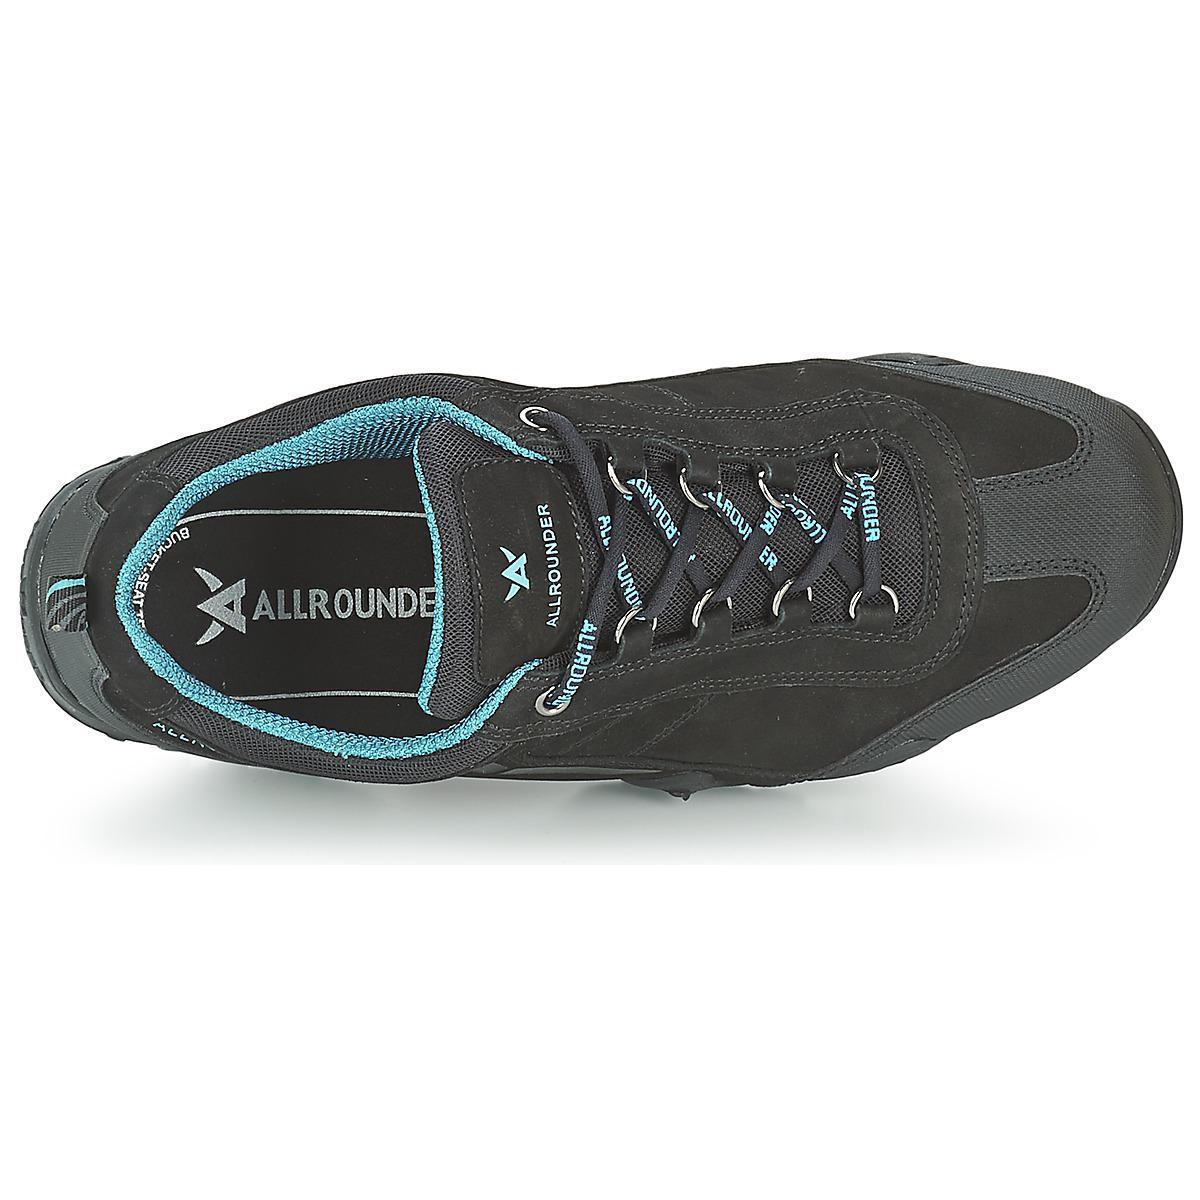 Allrounder By Mephisto Leather Fina Tek Women's Walking Boots In Grey in Grey